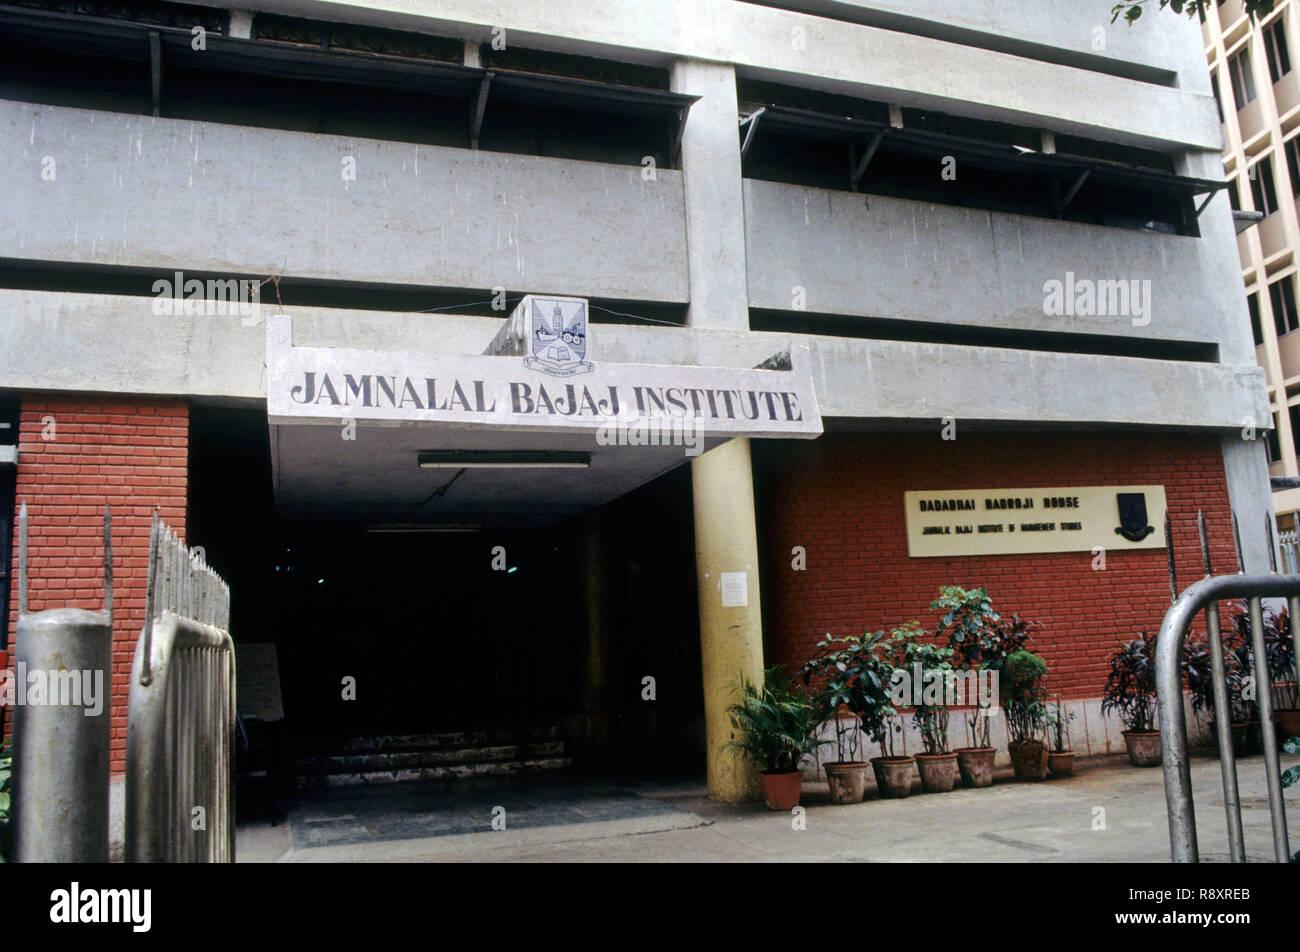 Bajaj India Stock Photos & Bajaj India Stock Images - Alamy